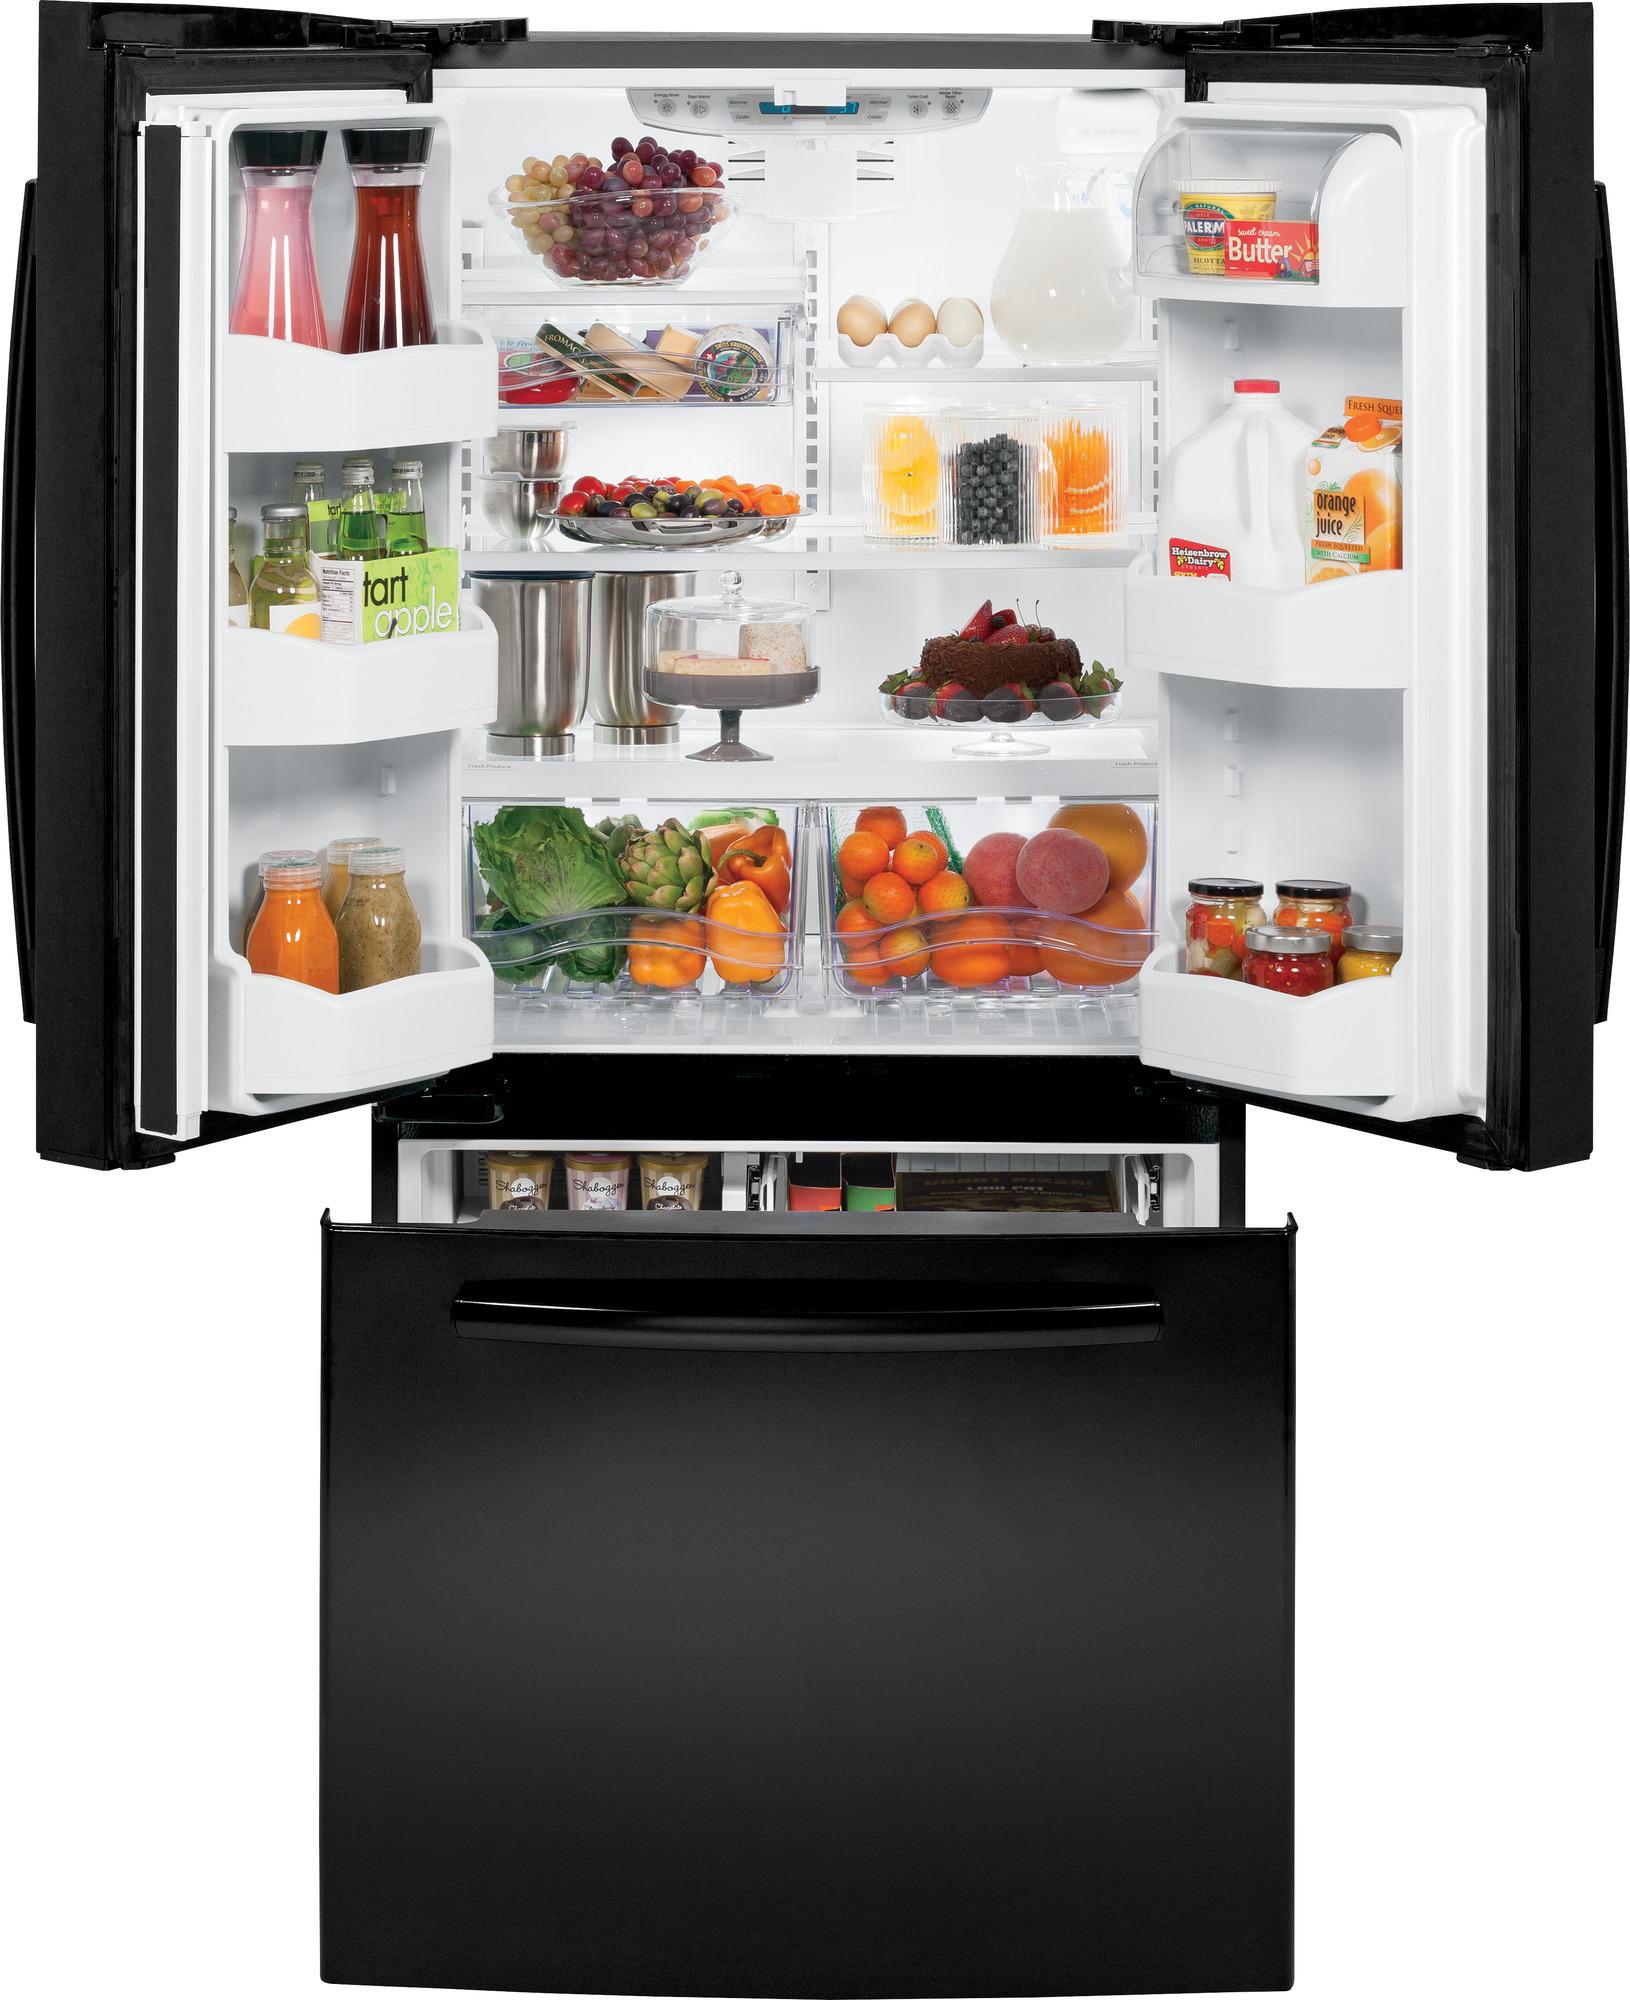 GE Appliances GNS23GGHBB 22.7 cu. ft. French-Door Refrigerator - Black